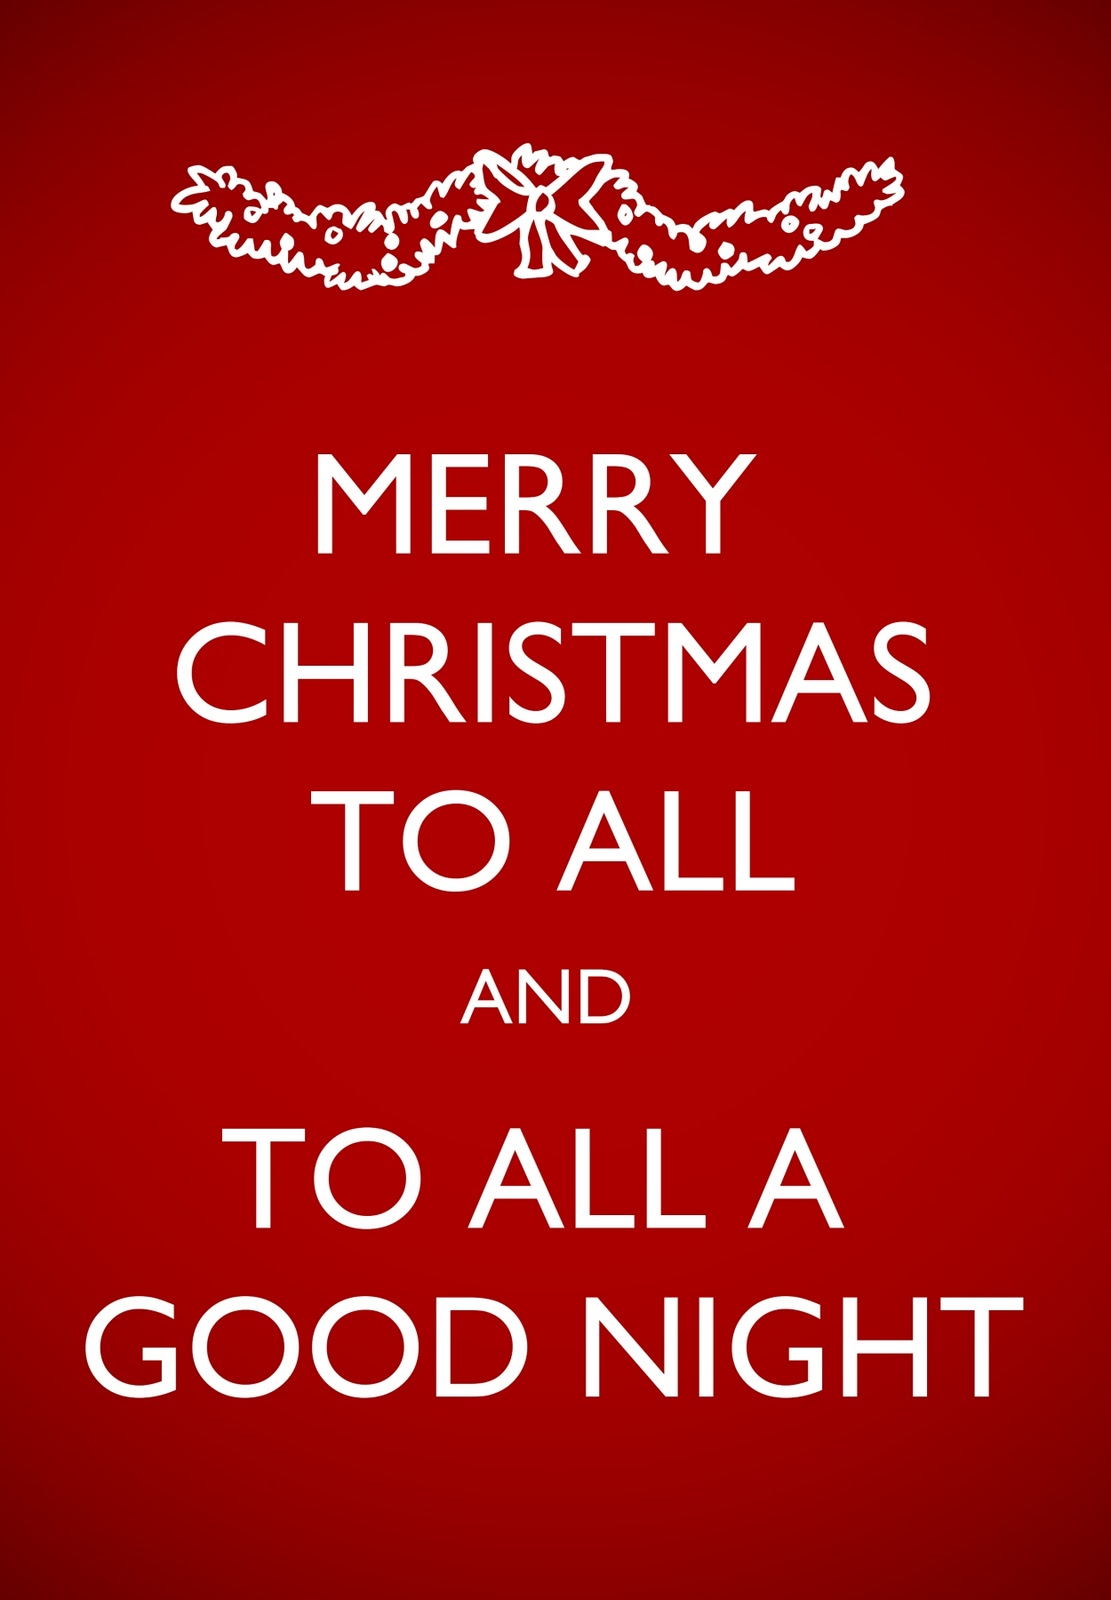 Agape Love Designs Merry Christmas To All Printable S